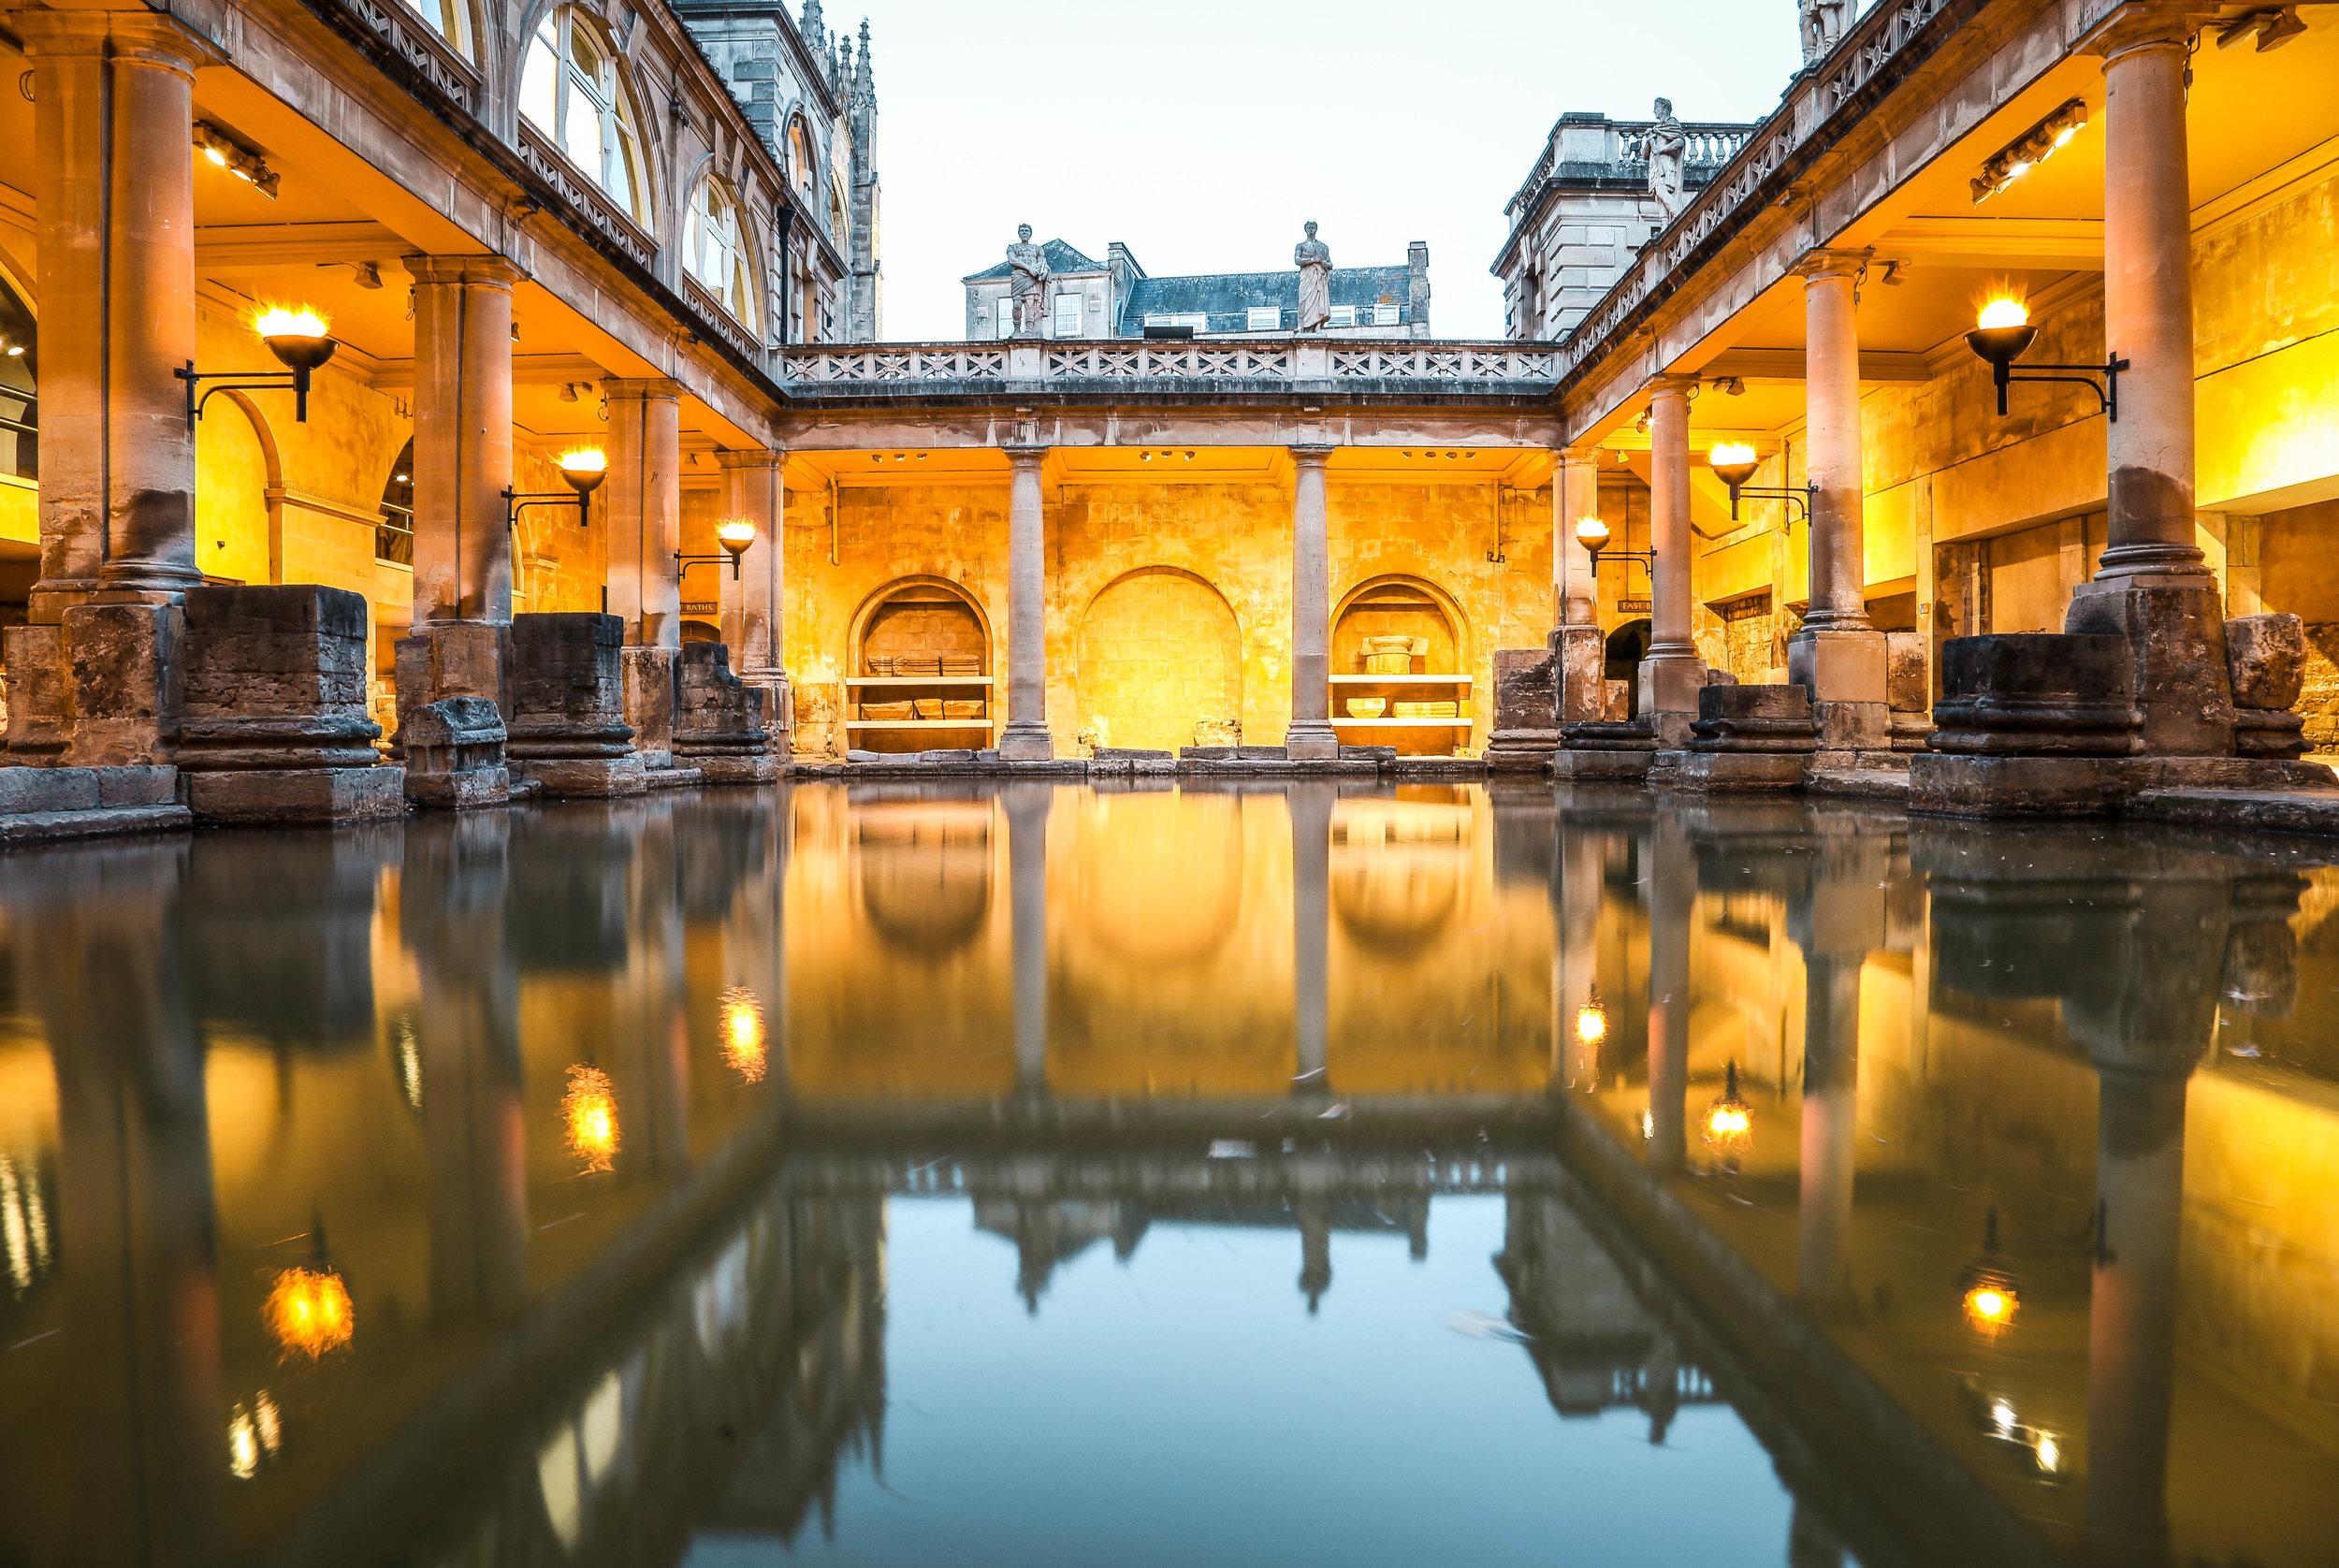 The Roman Baths  Bath UK